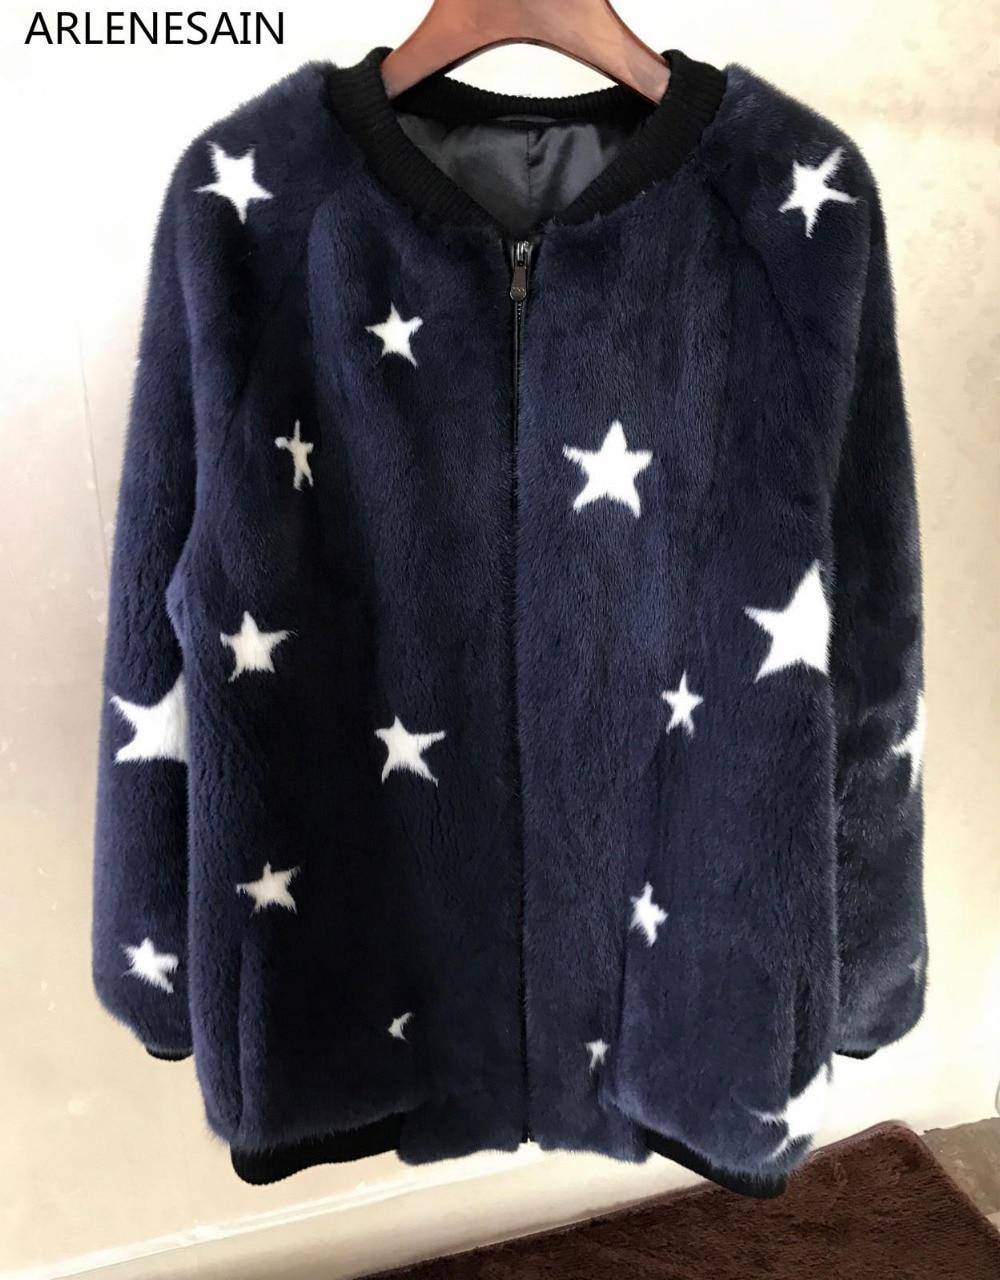 Abrigo de piel de visón personalizado de terciopelo Arlenesain, Túnica de piel, abrigo de béisbol de estrellas, abrigo de mujer